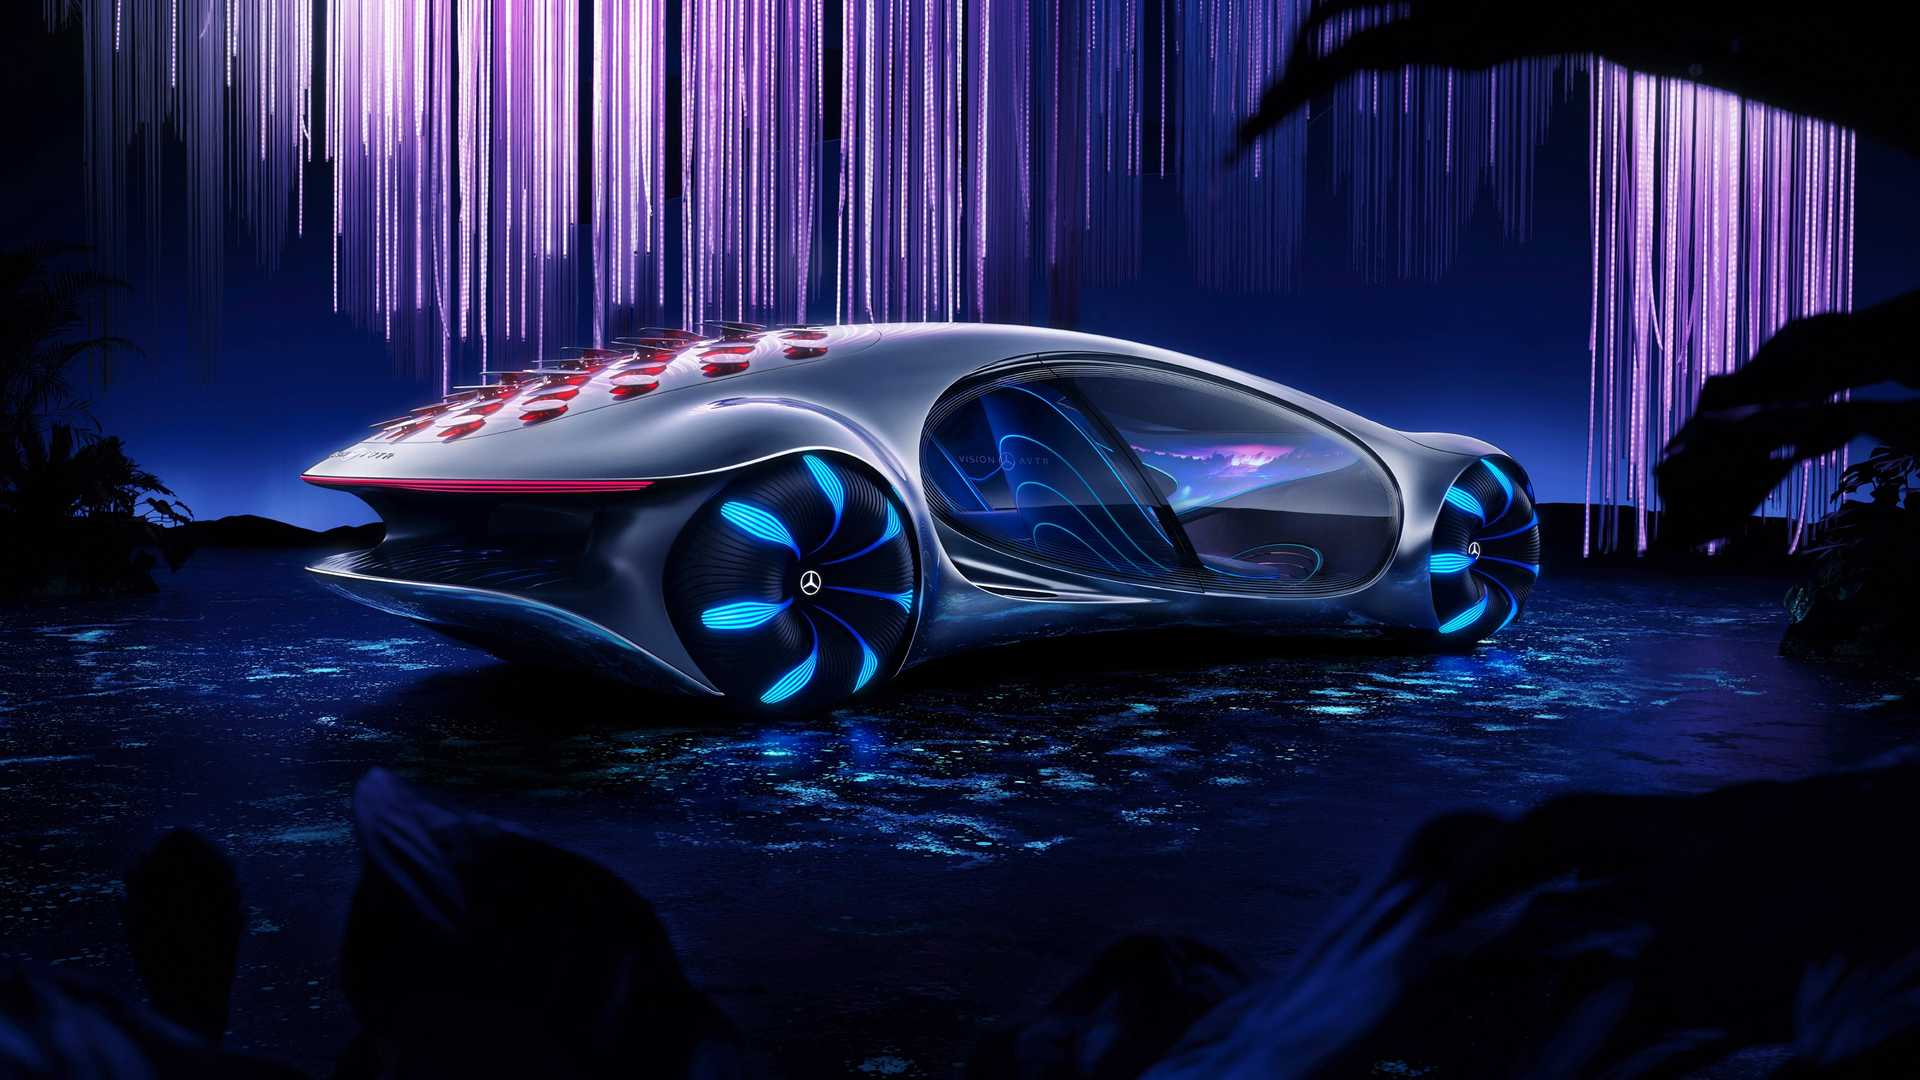 download 2020 CES Mercedes Benz Showcases Their Concept 1920x1080